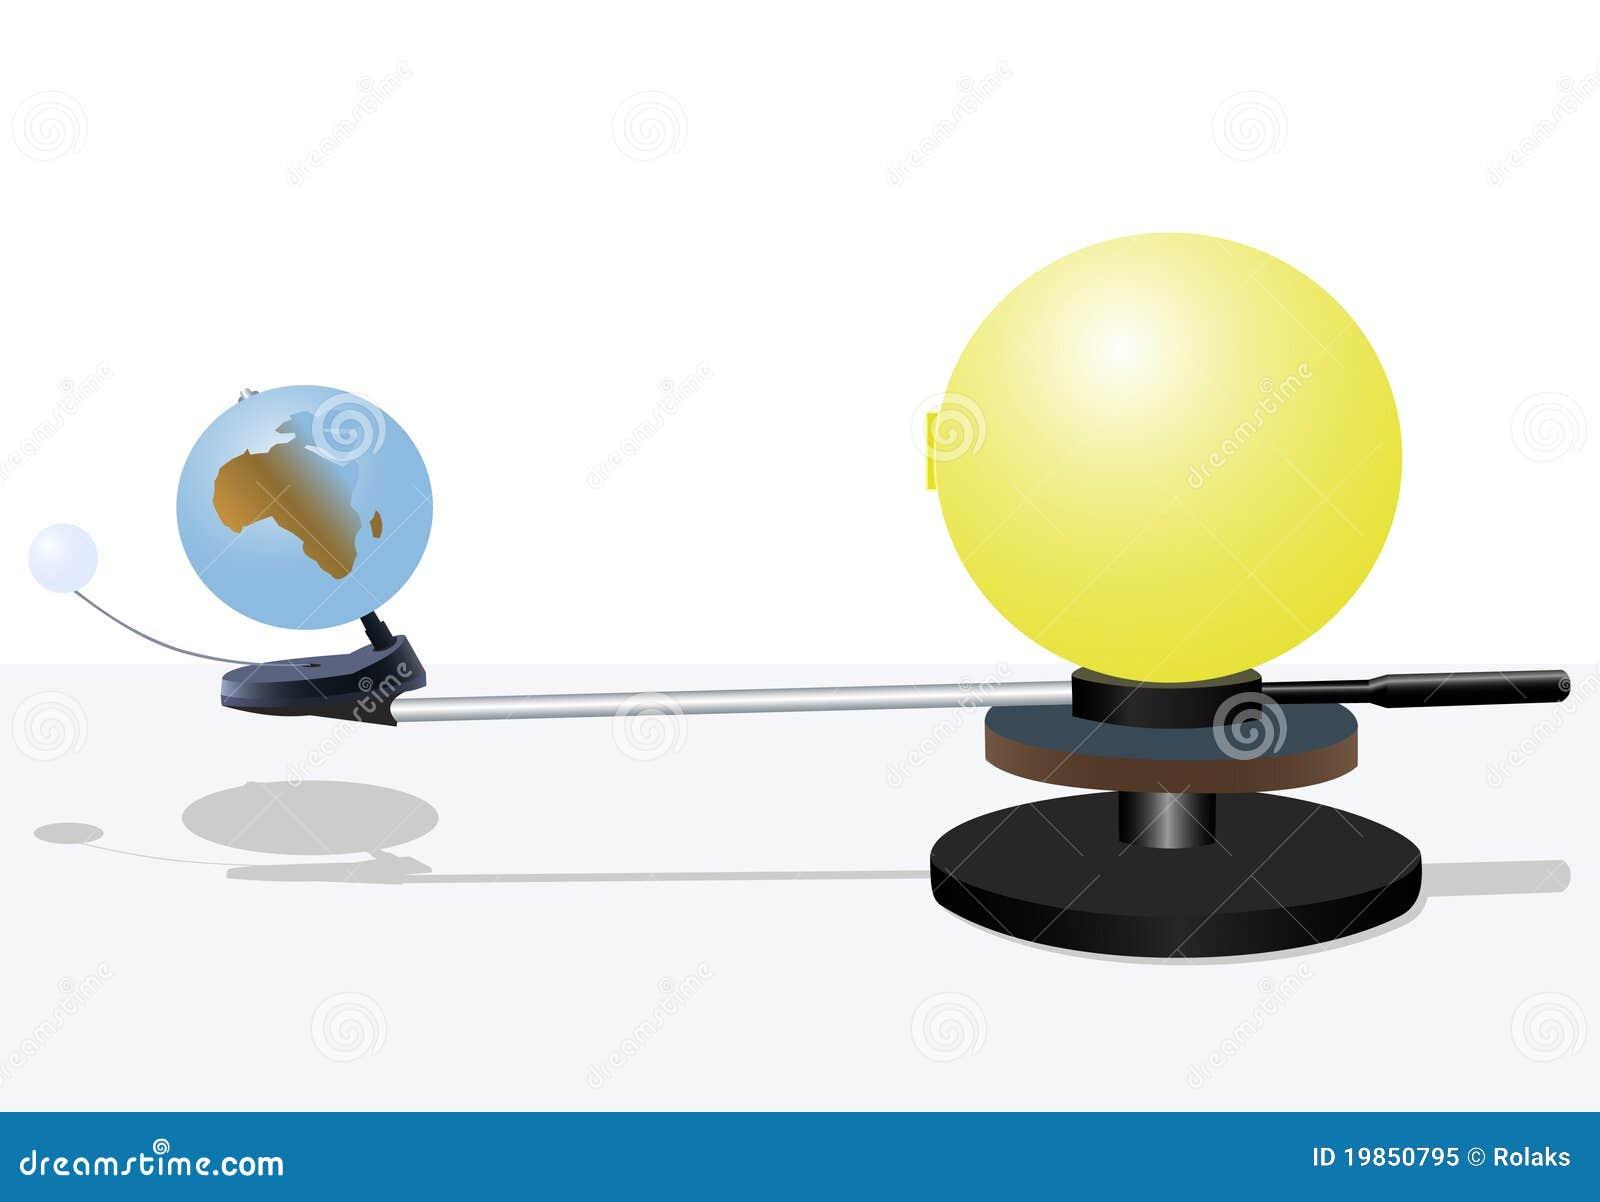 Sun and earth model